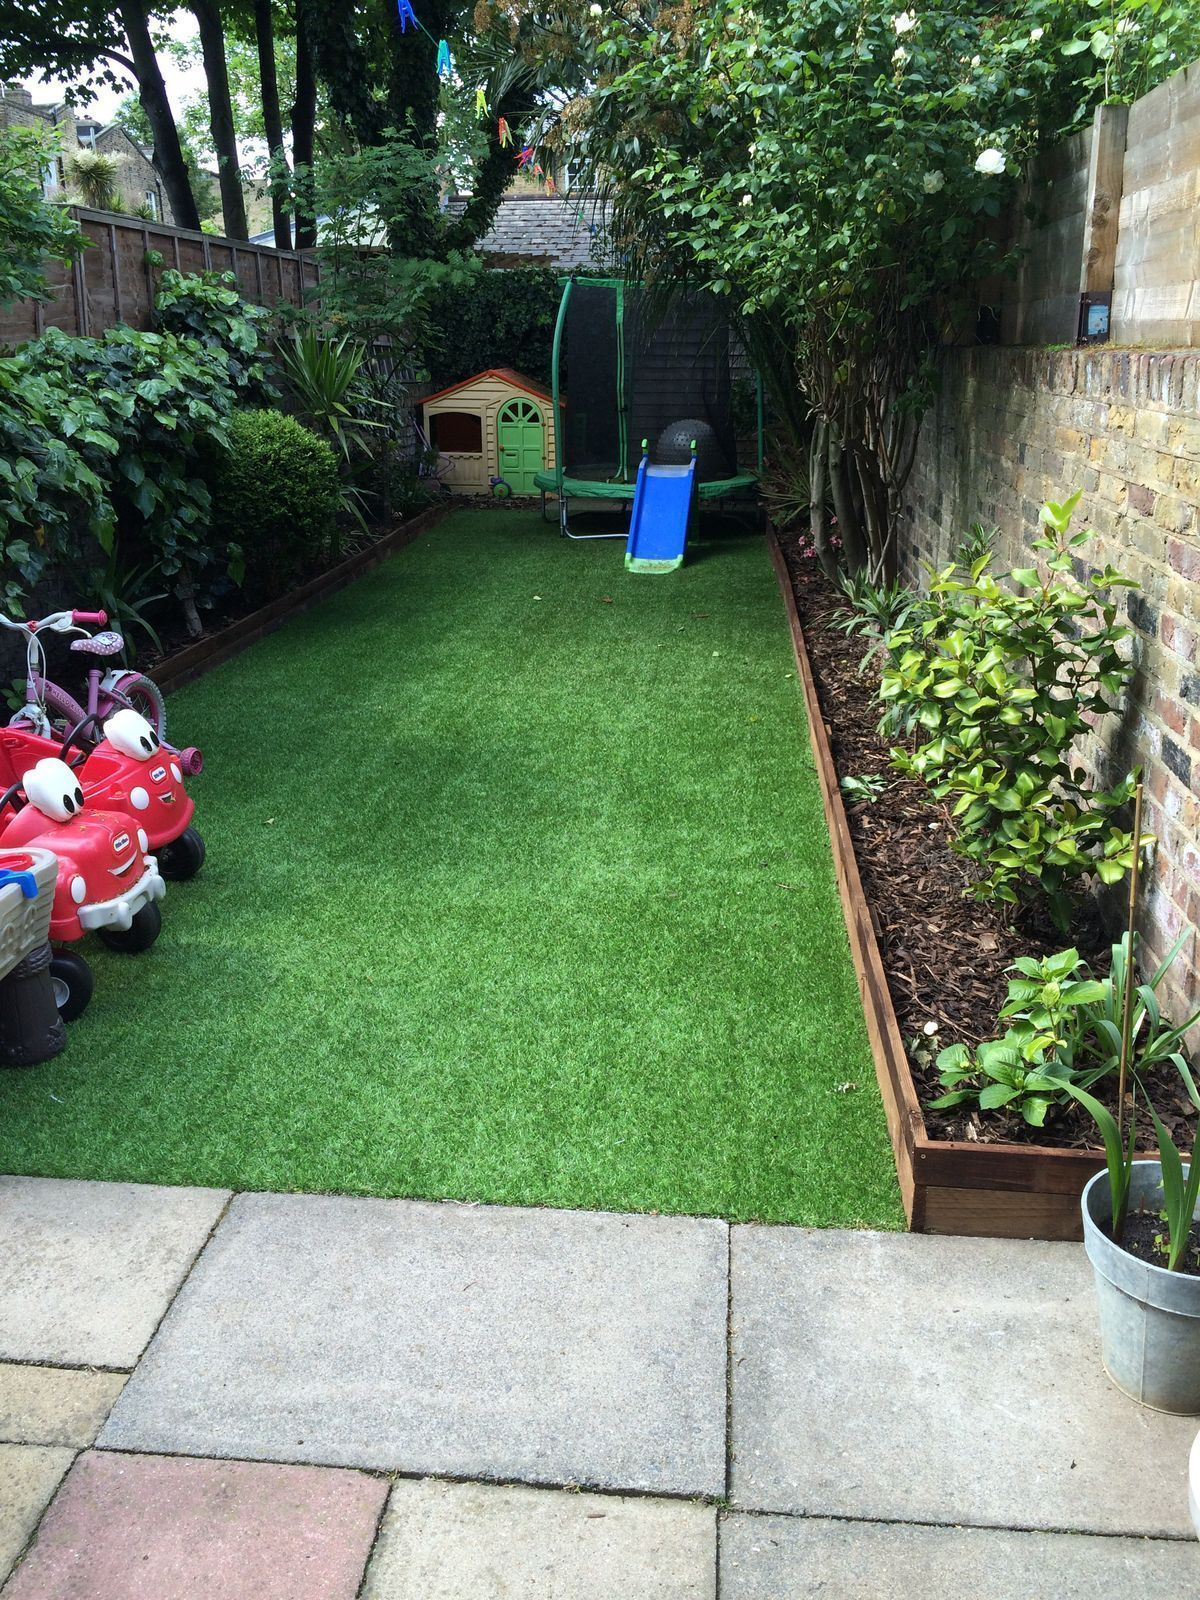 25 Awesome Small Backyard Ideas In 2020 Kleiner Hinterhof